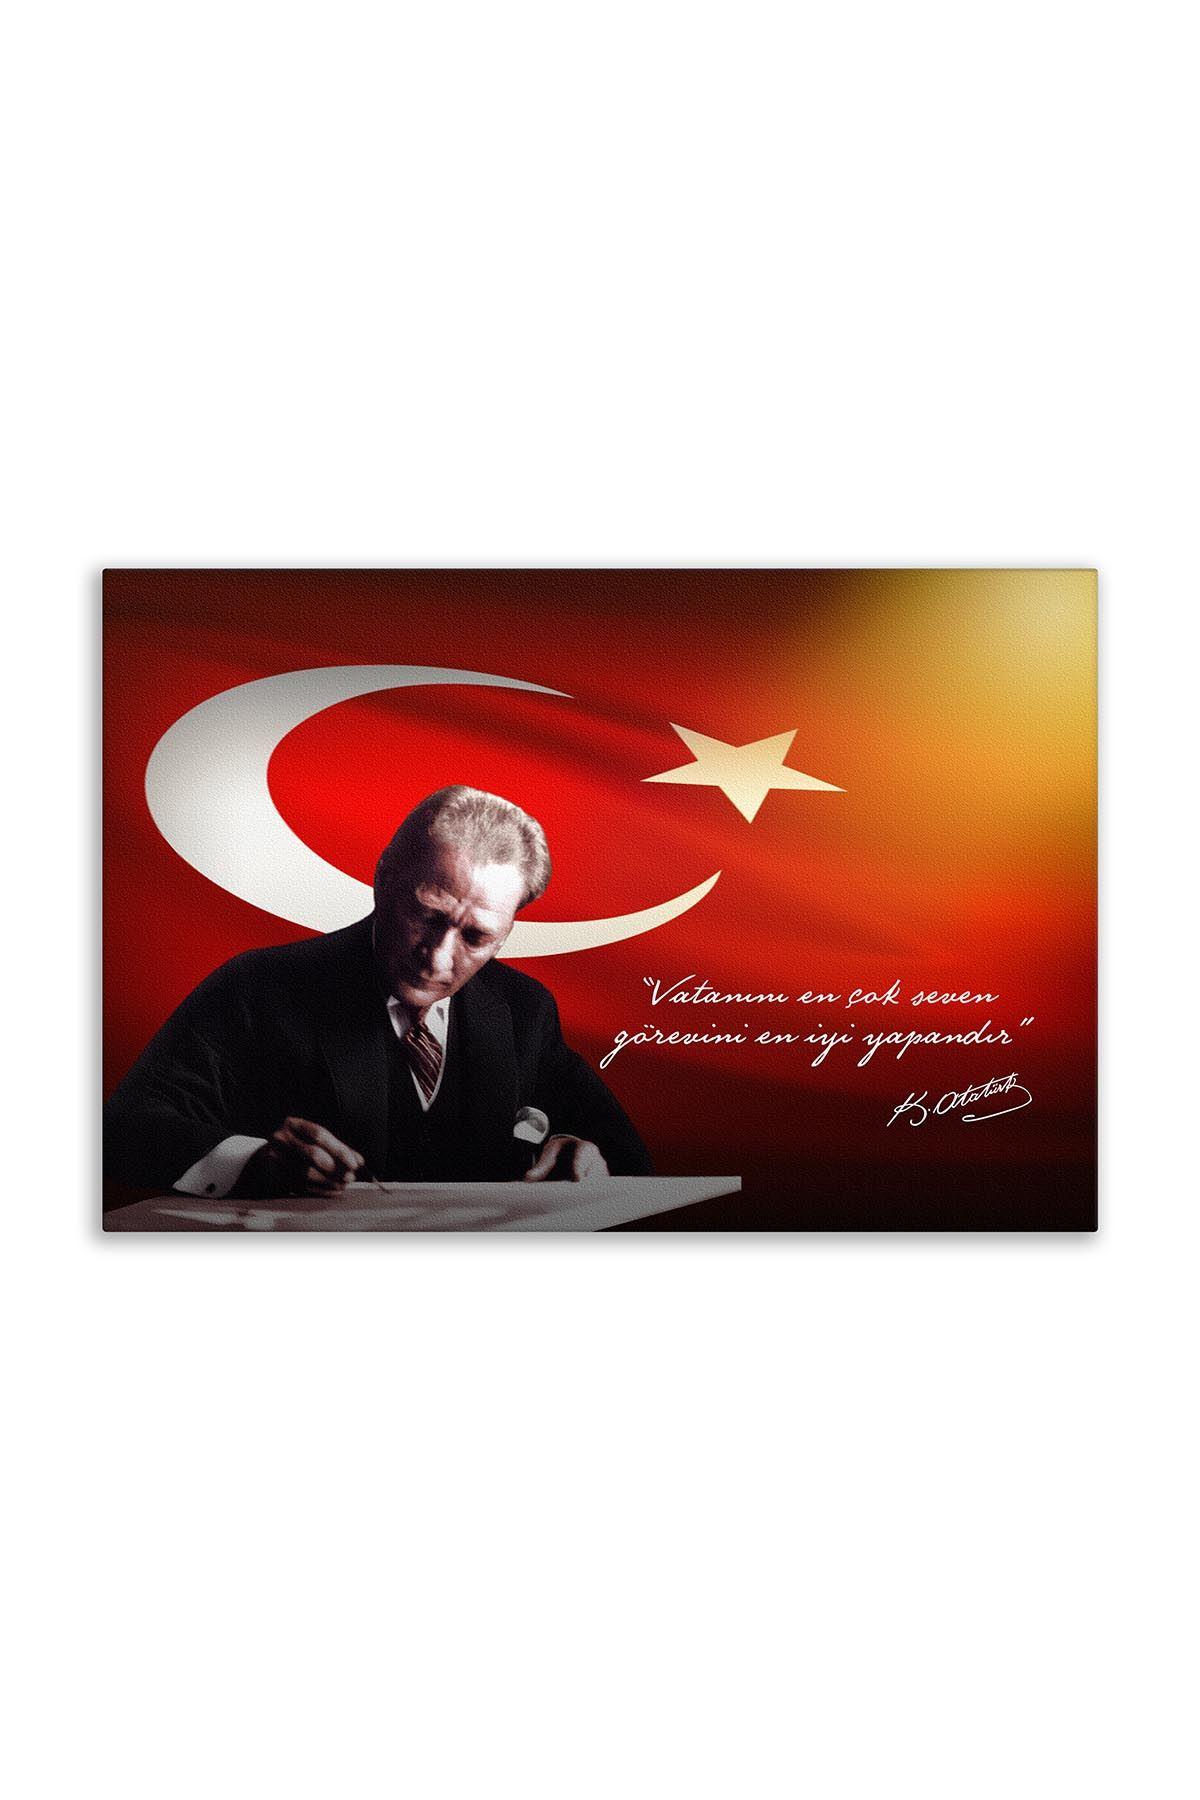 Ataturk Canvas Board | Printed Canvas Board | Customized Canvas Board | Digital Printing